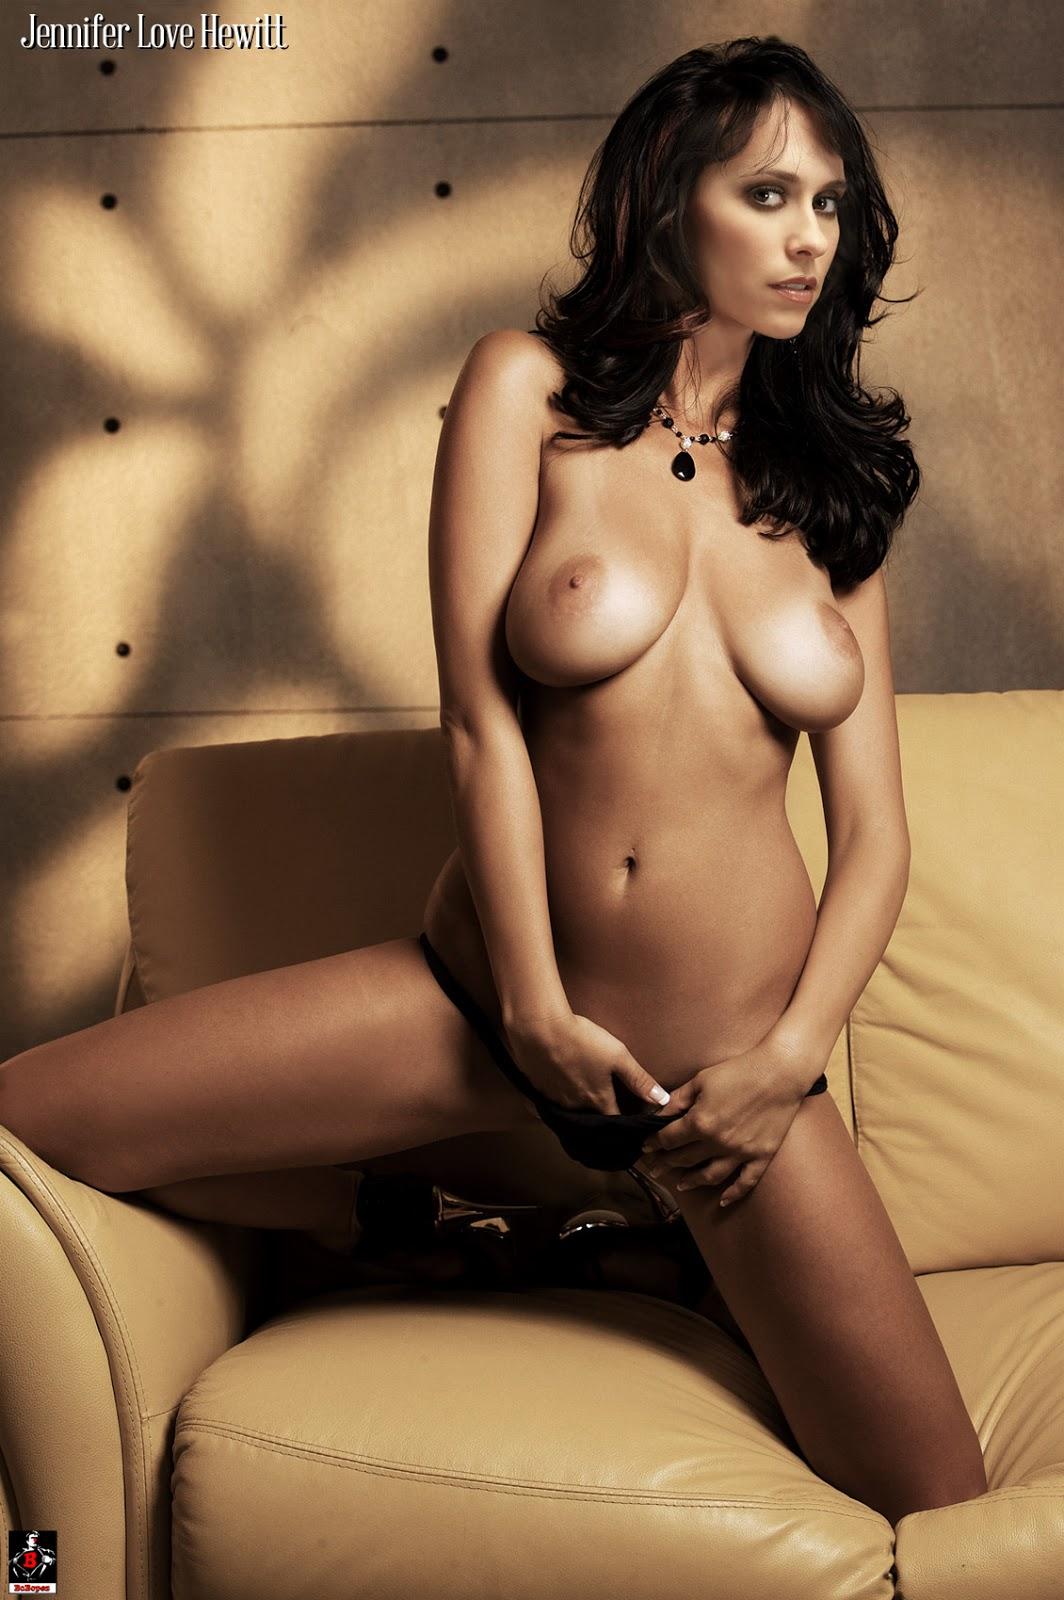 Jennifer love hewitt fake tits